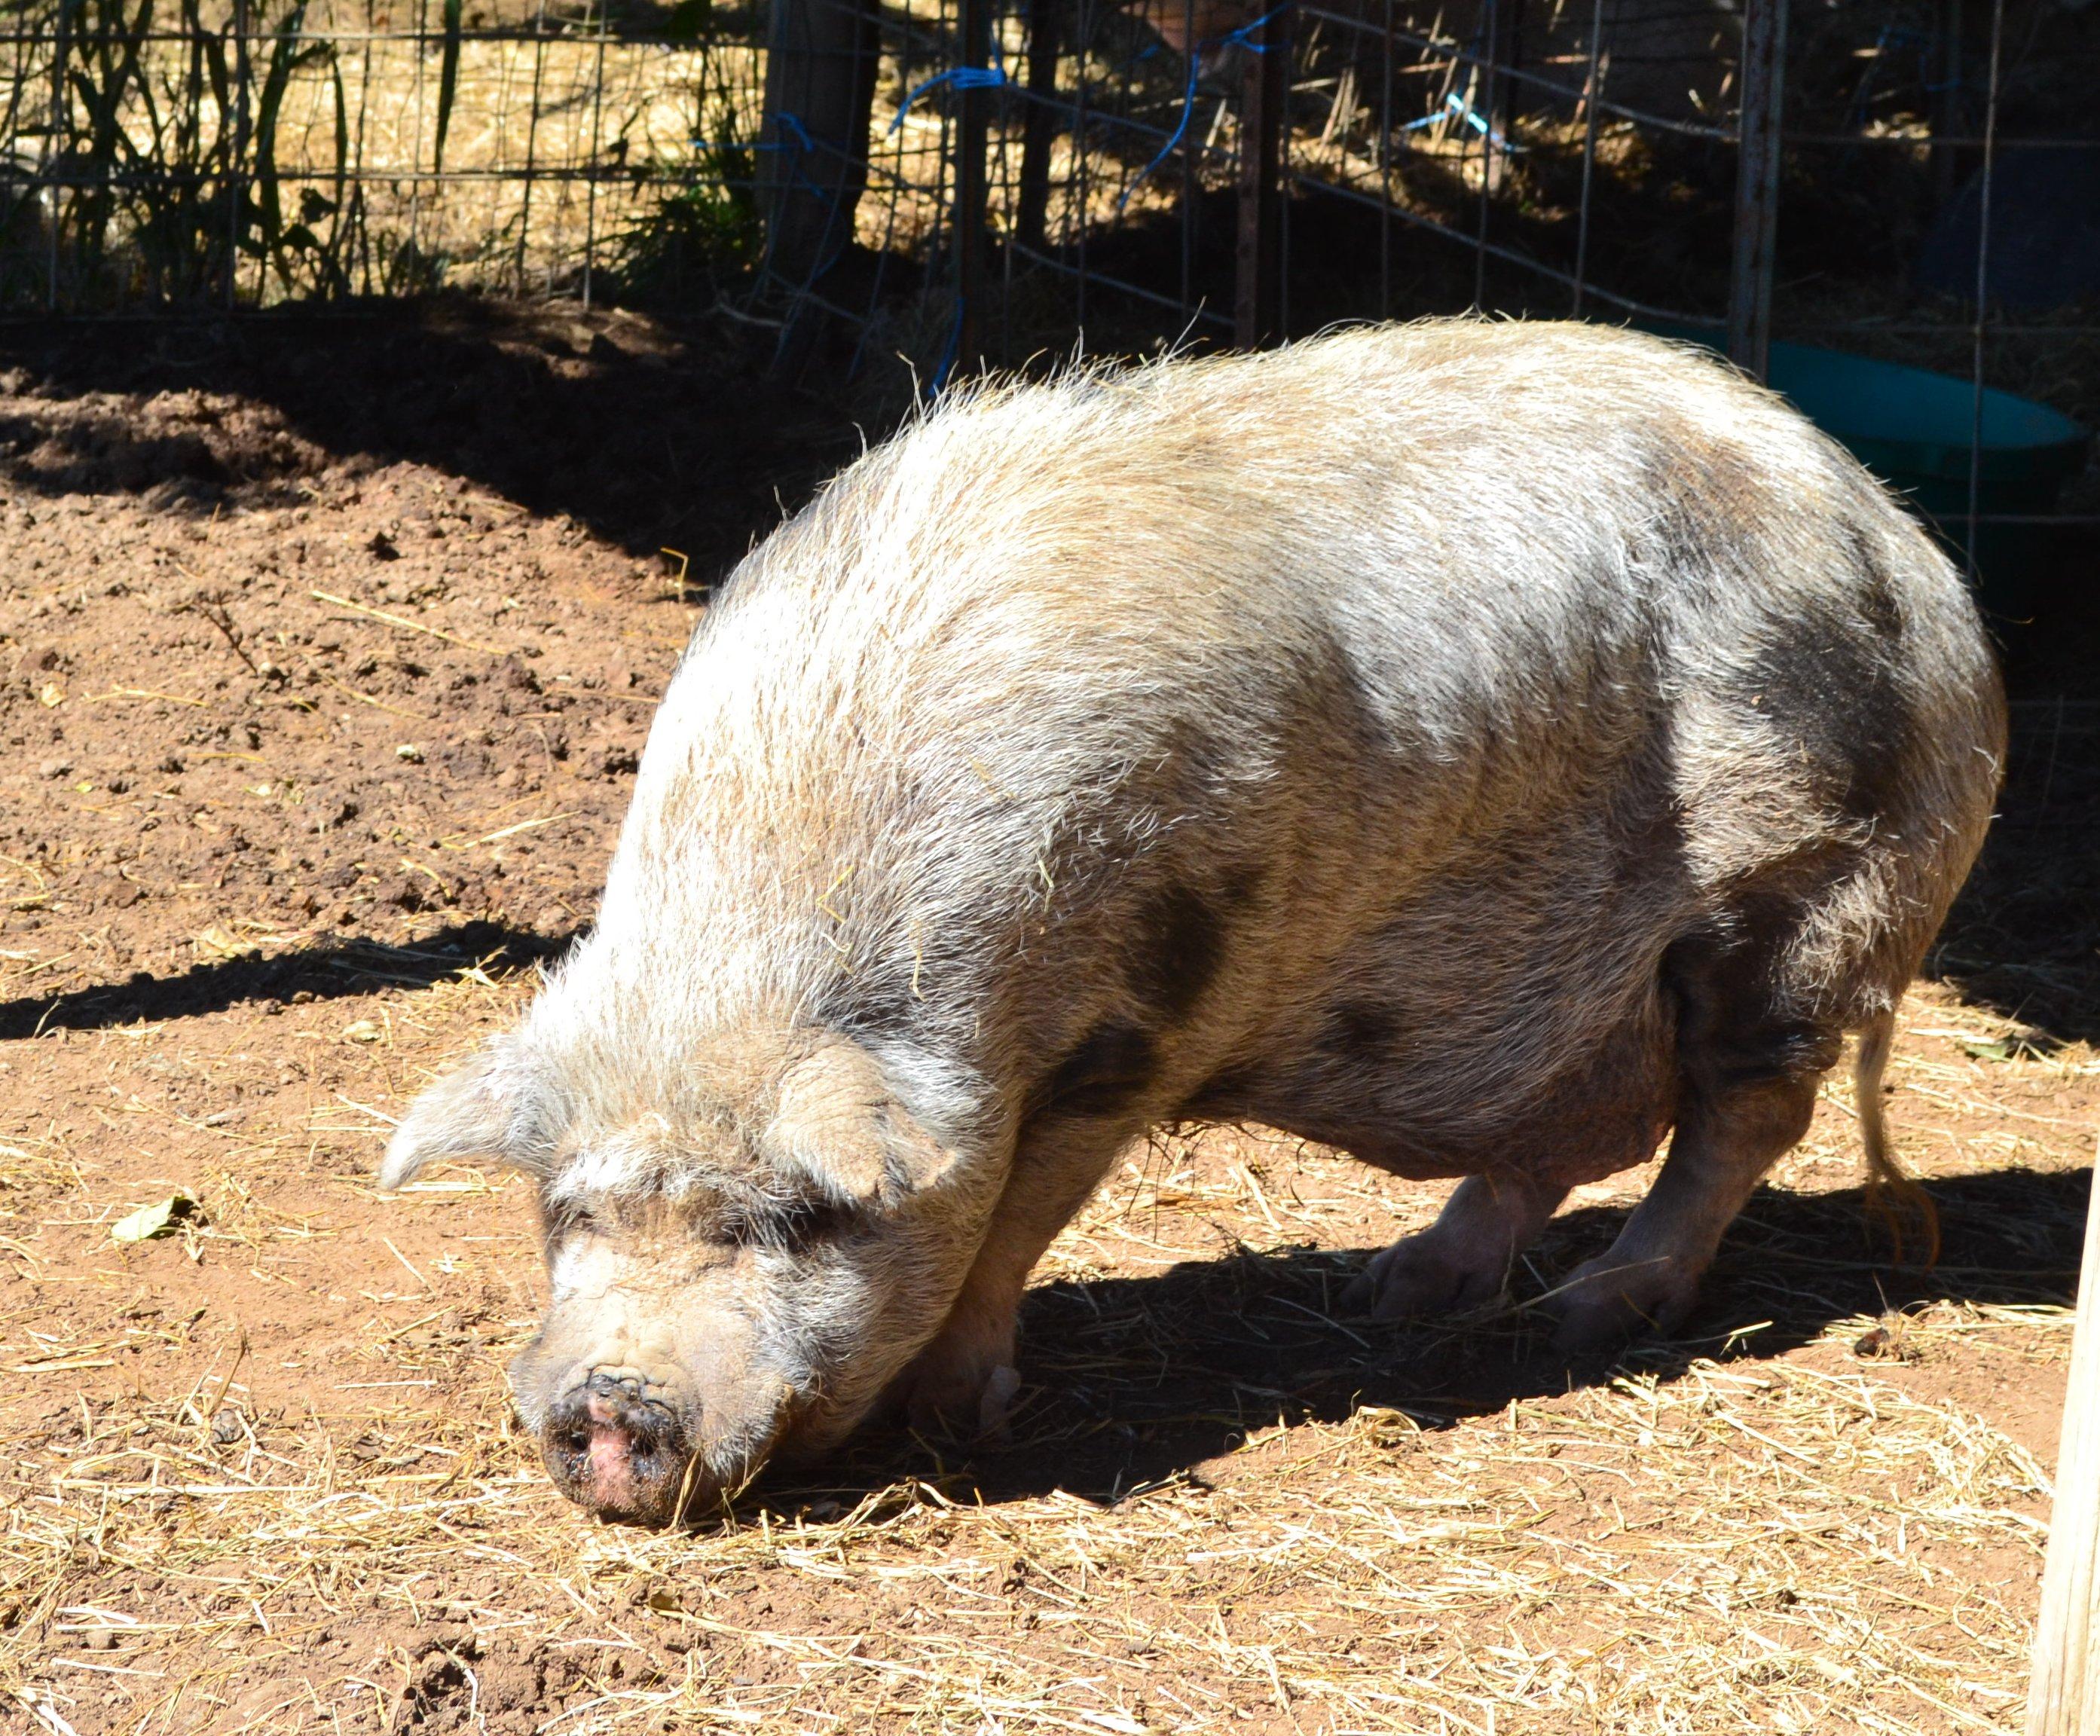 Penny Parrish, Hog